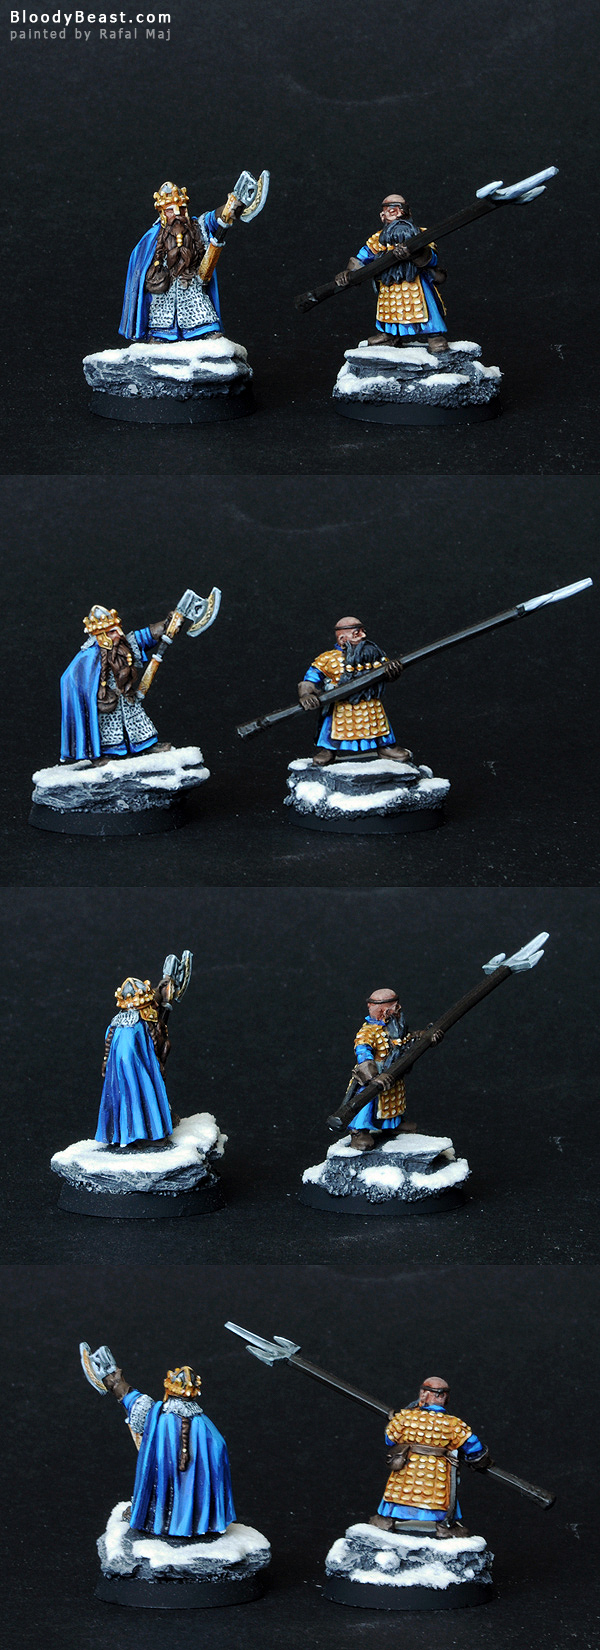 Dwarf Durin and Mardin painted by Rafal Maj (BloodyBeast.com)